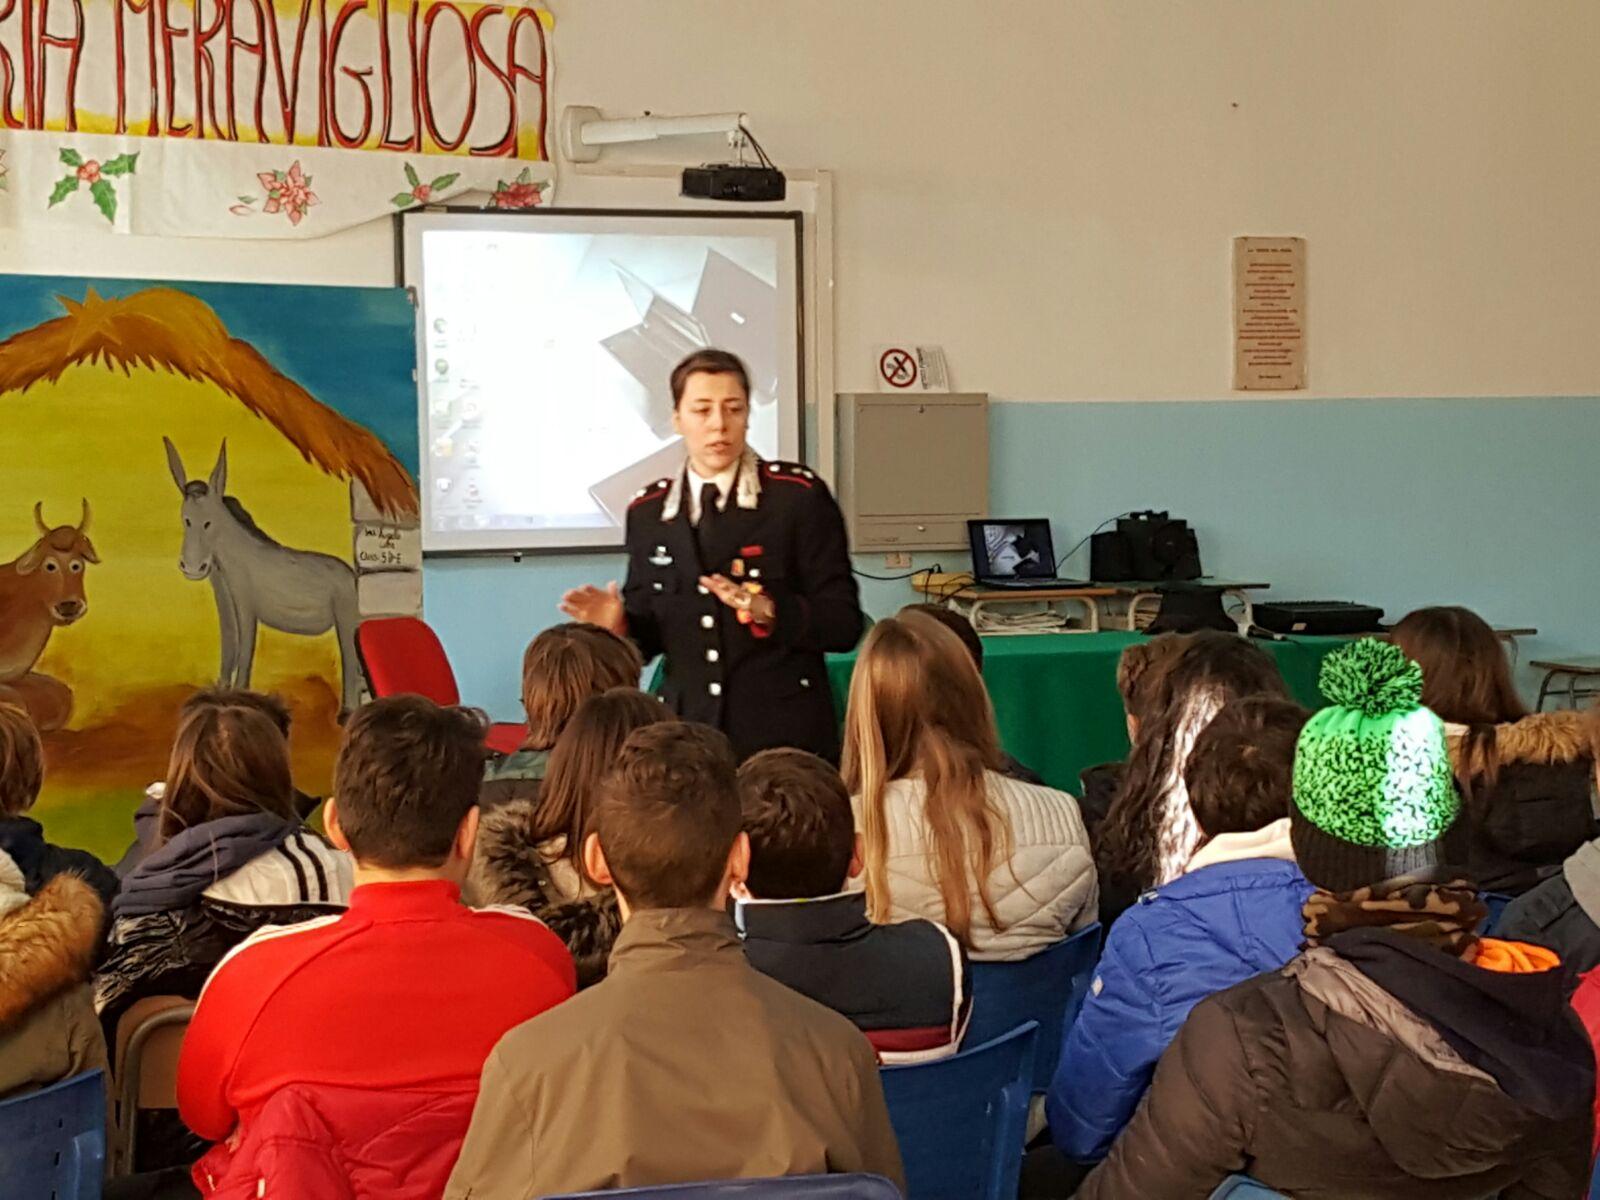 Bullismo, i carabinieri all'Istituto comprensivo Verga di Siracusa